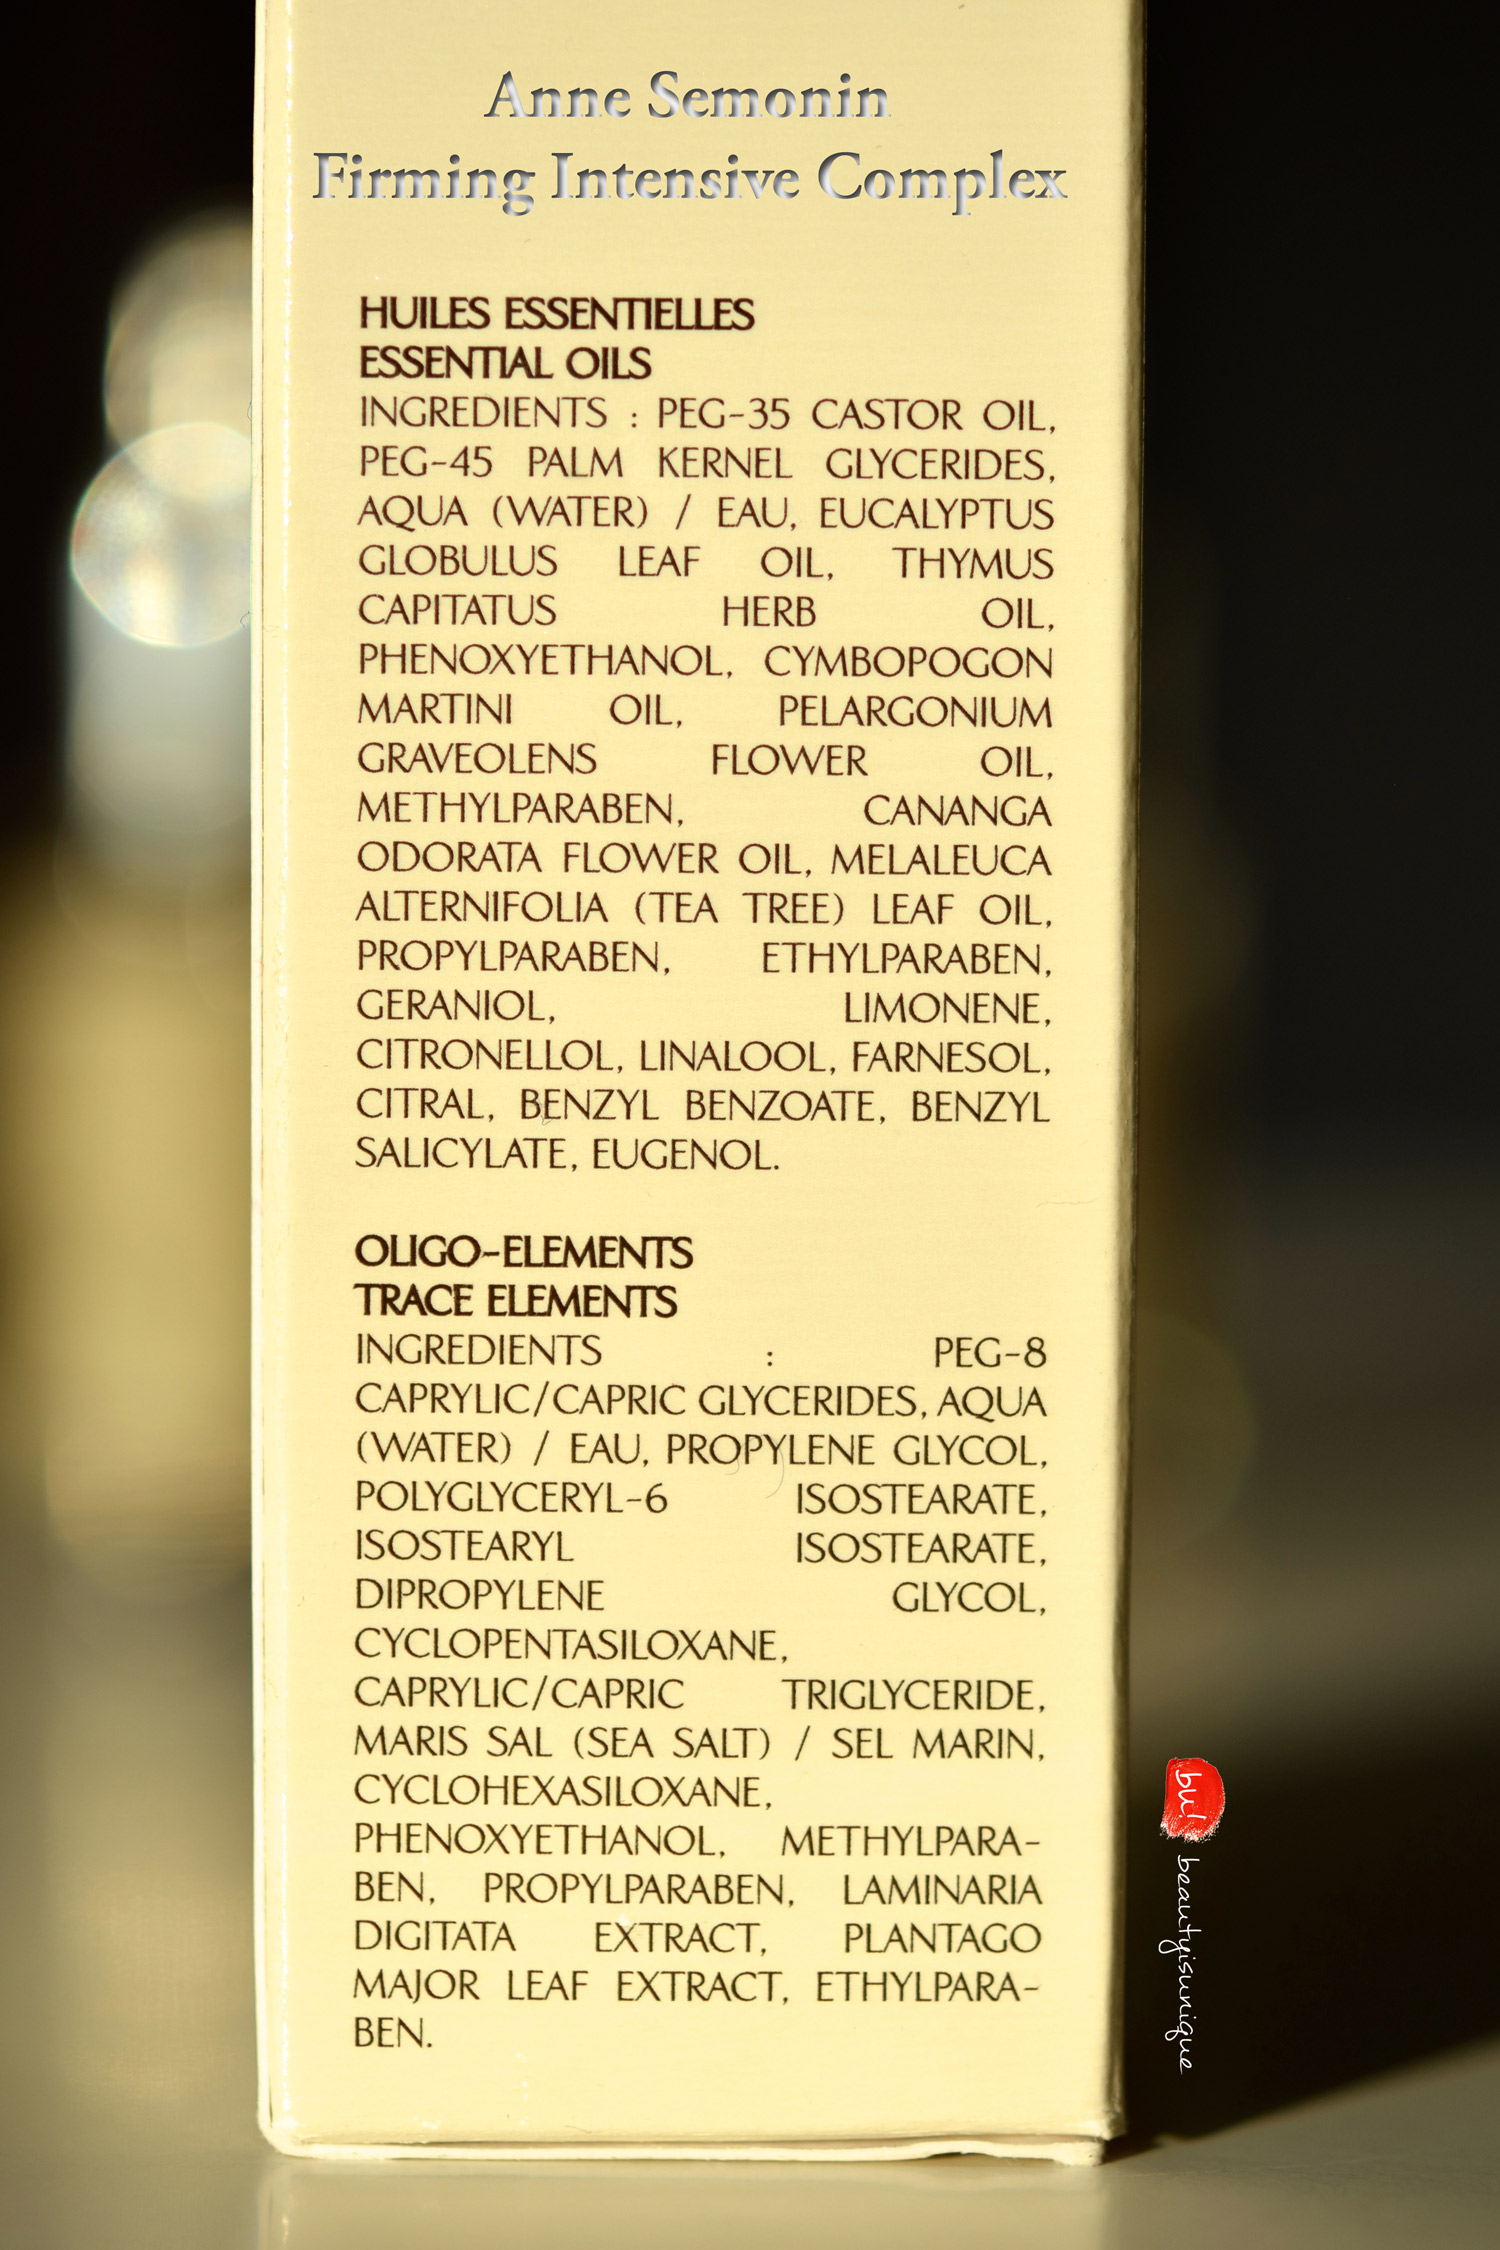 Anne-semonin-firming-intensive-complex-ingredients